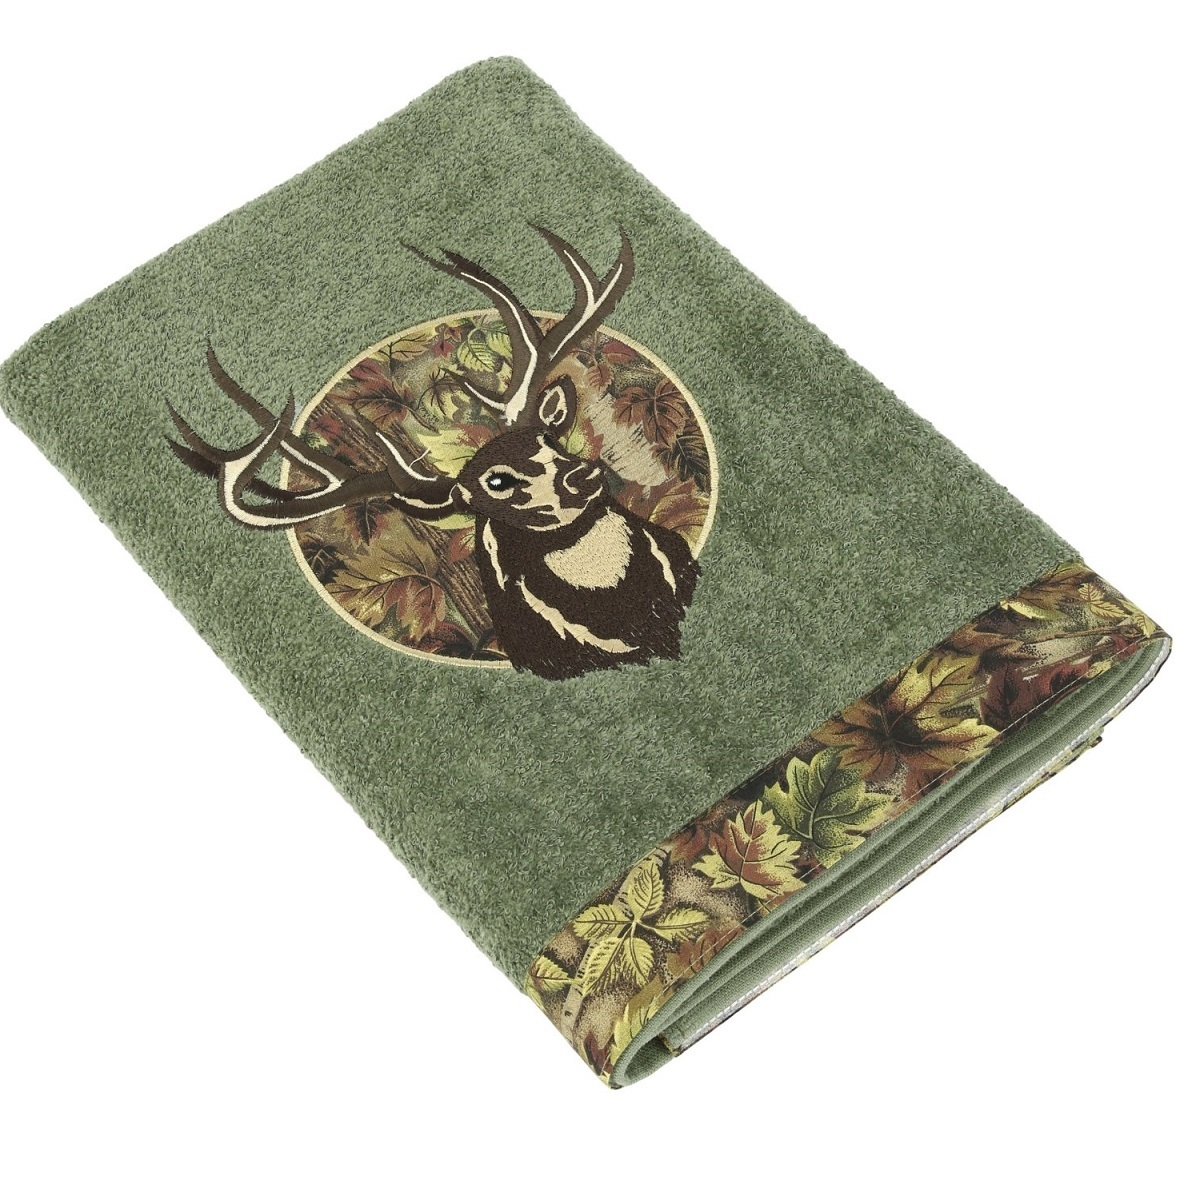 Полотенца Полотенце 41х76 Avanti Camo Deer зеленое elitnoe-polotentse-mahrovoe-camo-deer-zelenoe-ot-avanti-kanada-bannoye.jpg